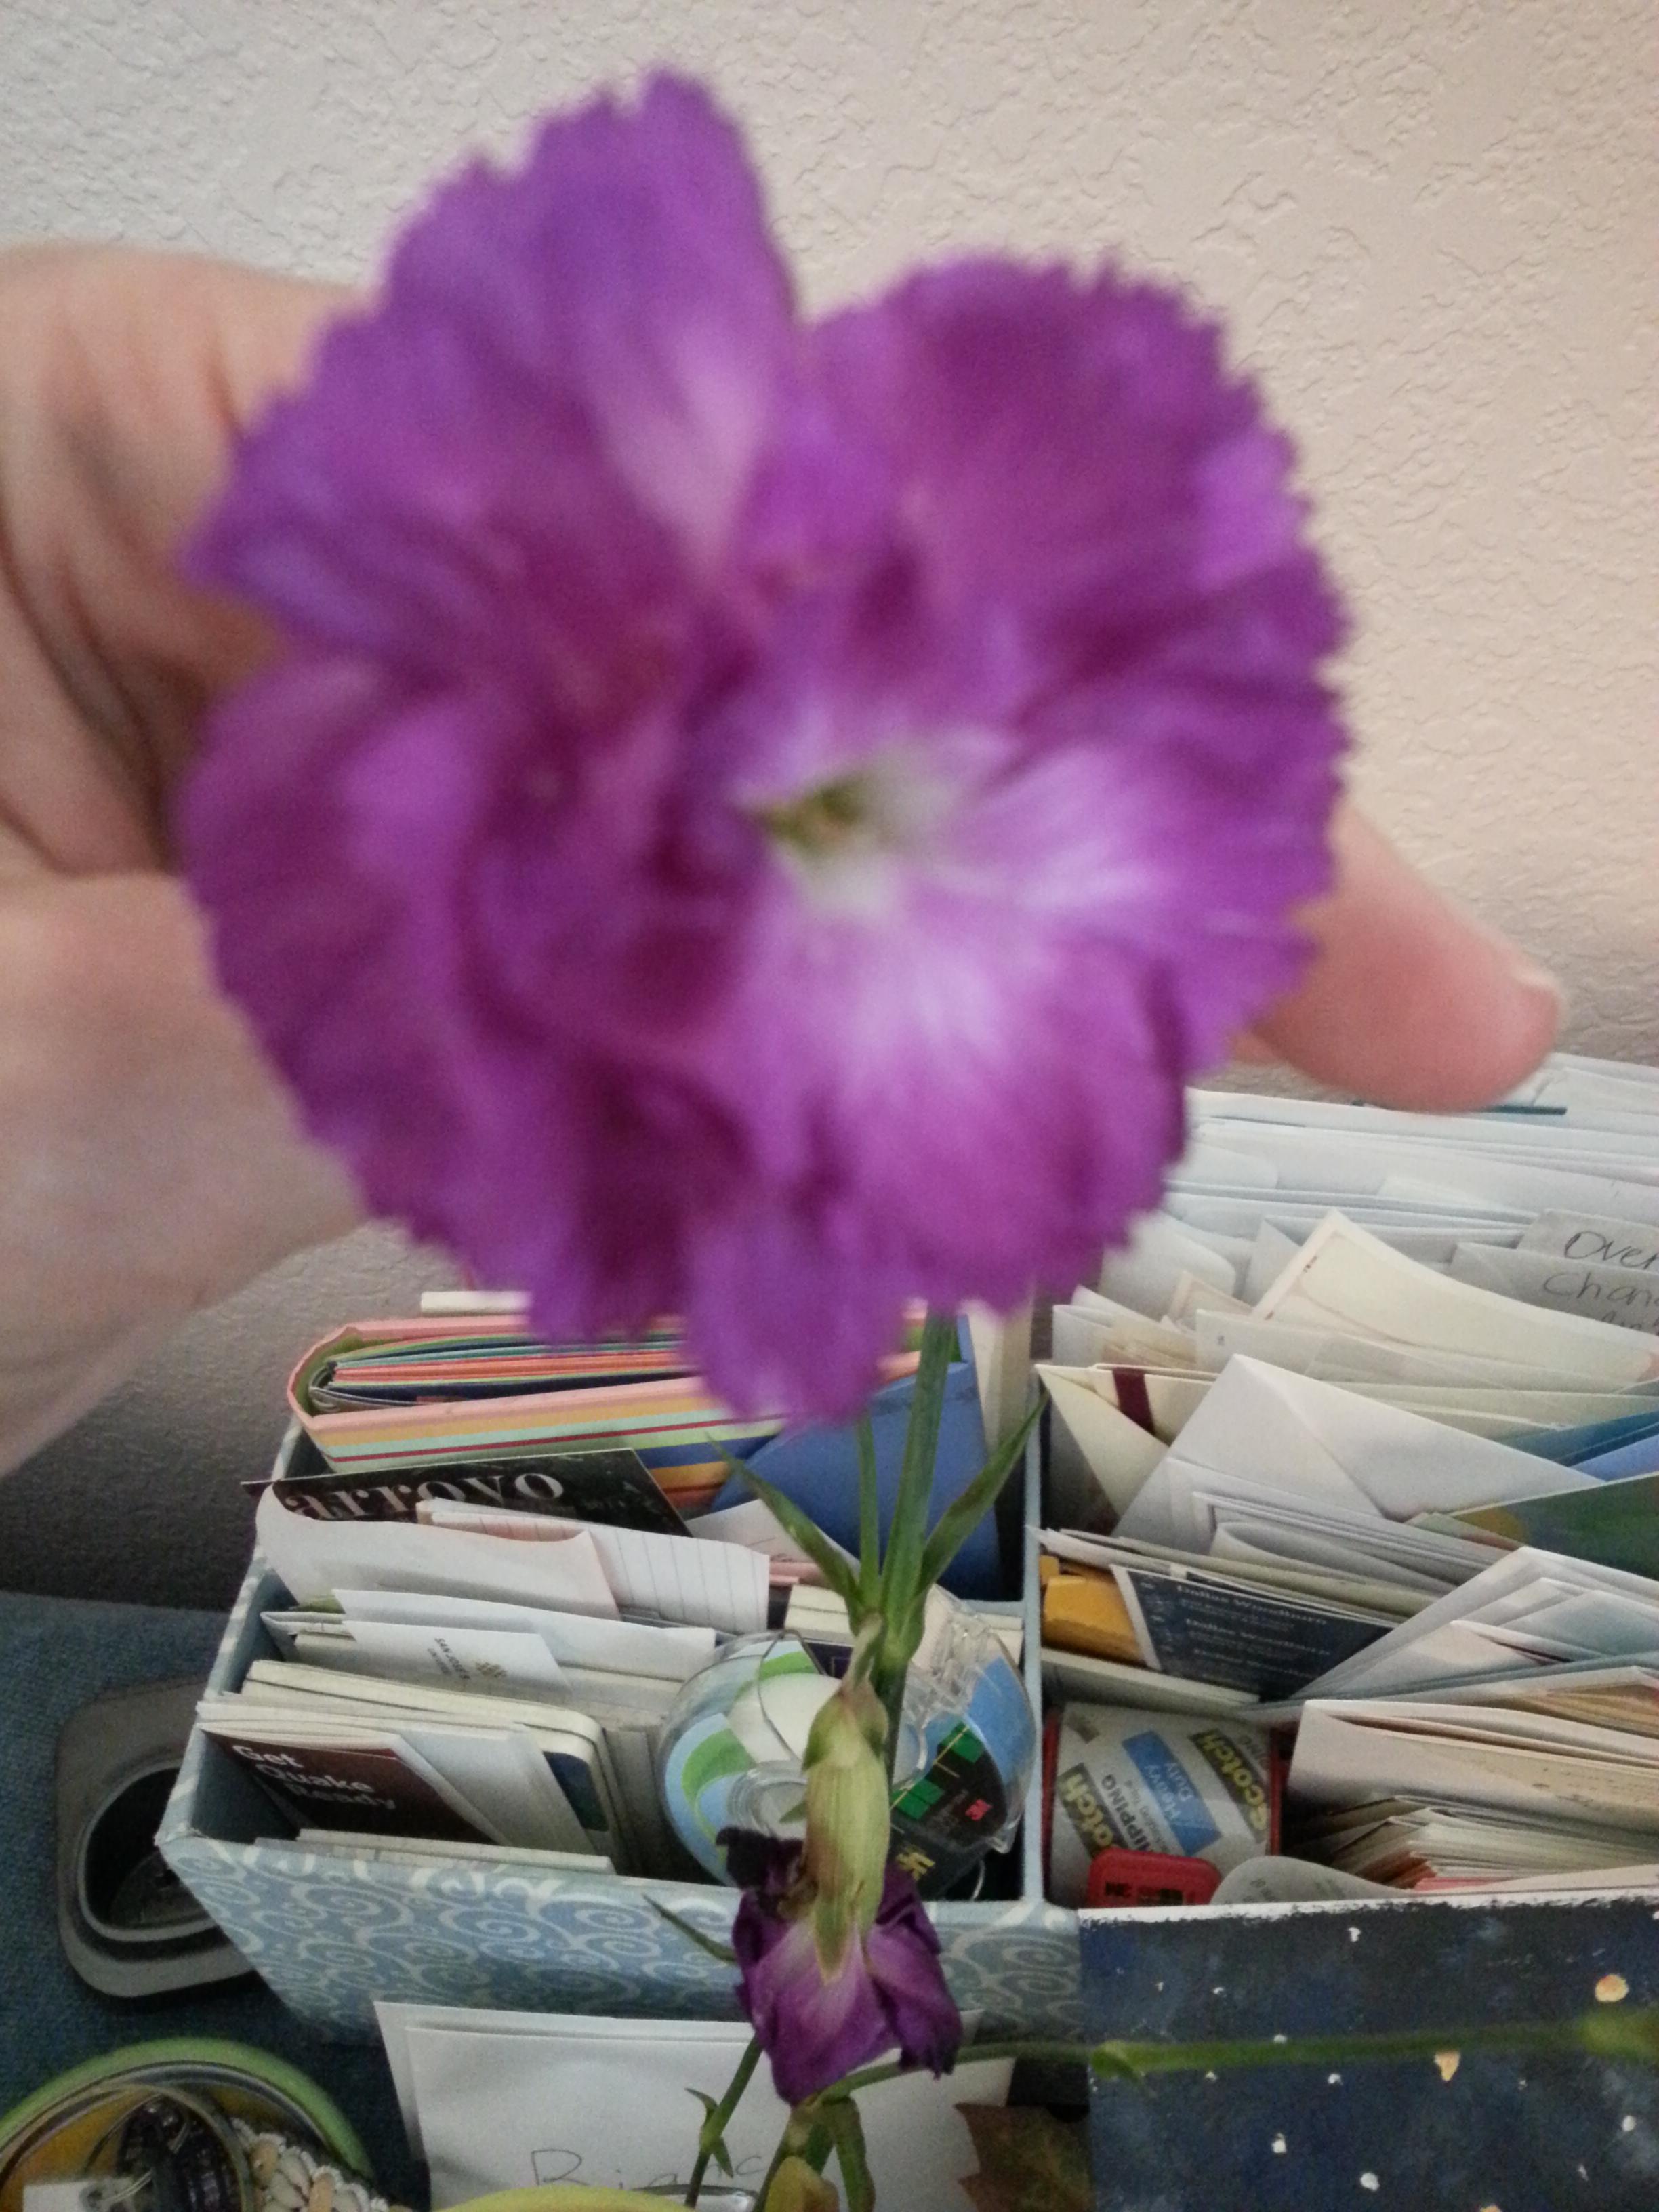 flower from grandma